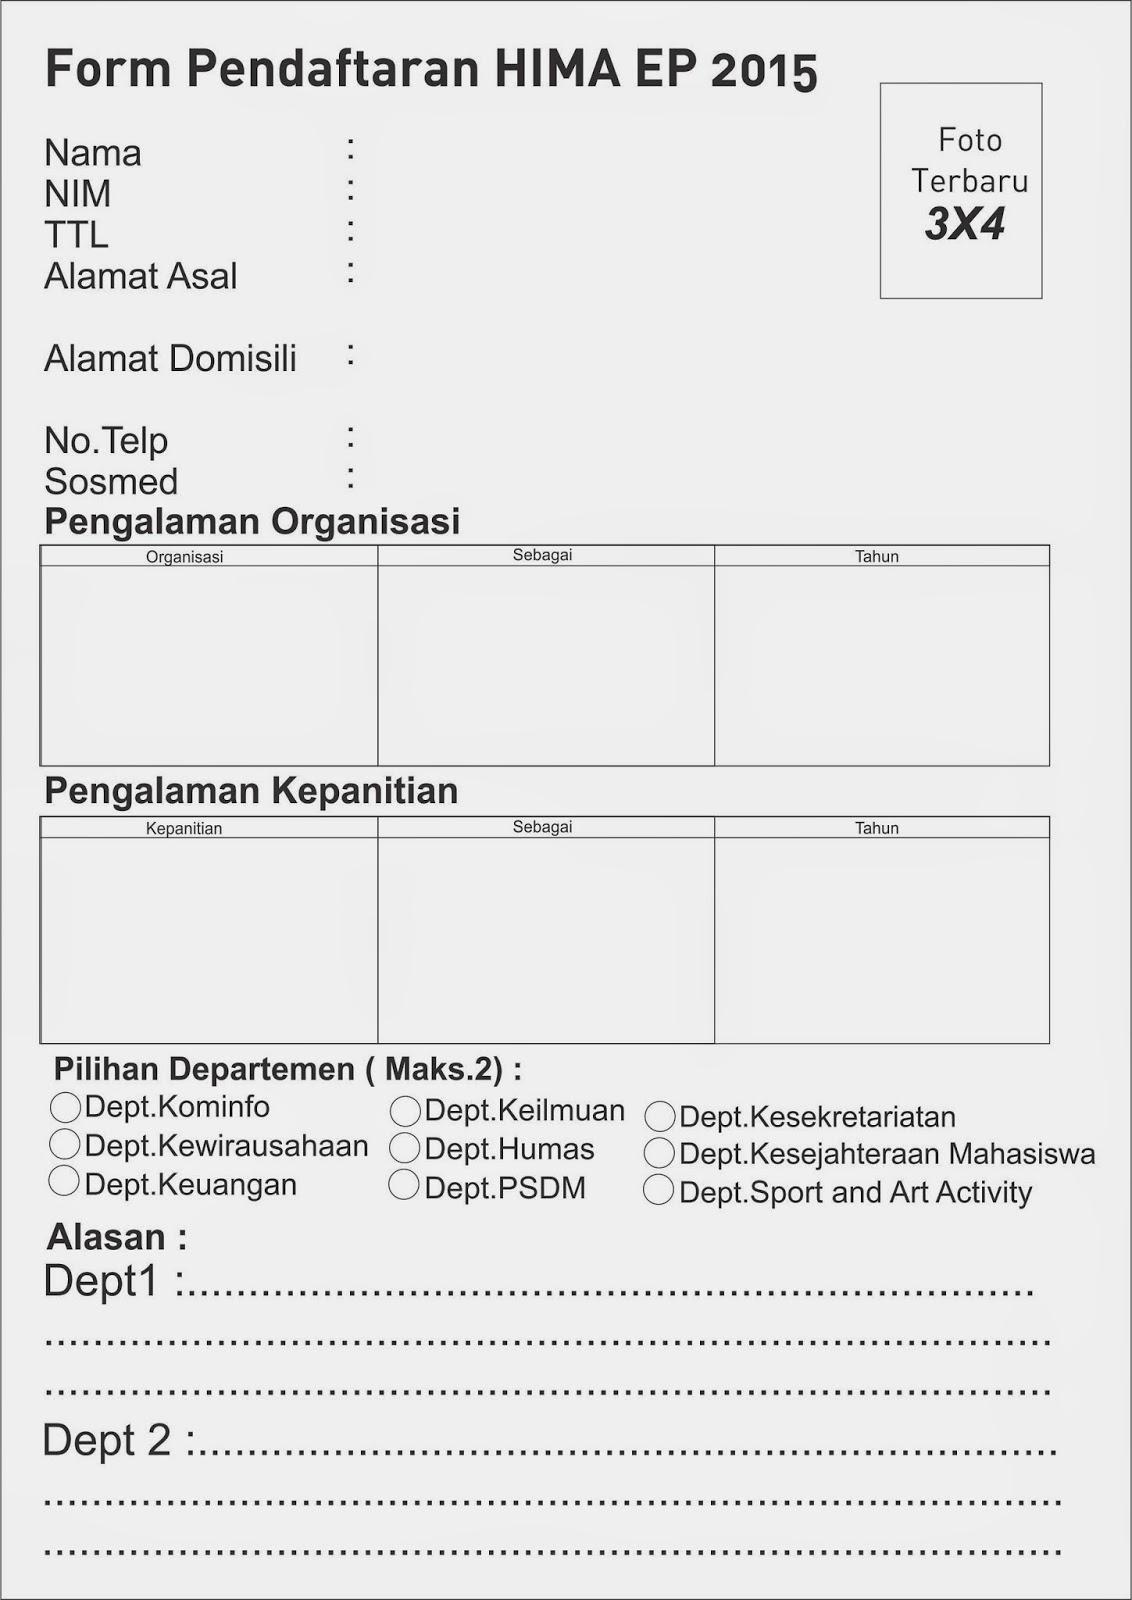 Gambar 2014 Hima Ep Unair Formulir Open Recruitment Pengurus 2015